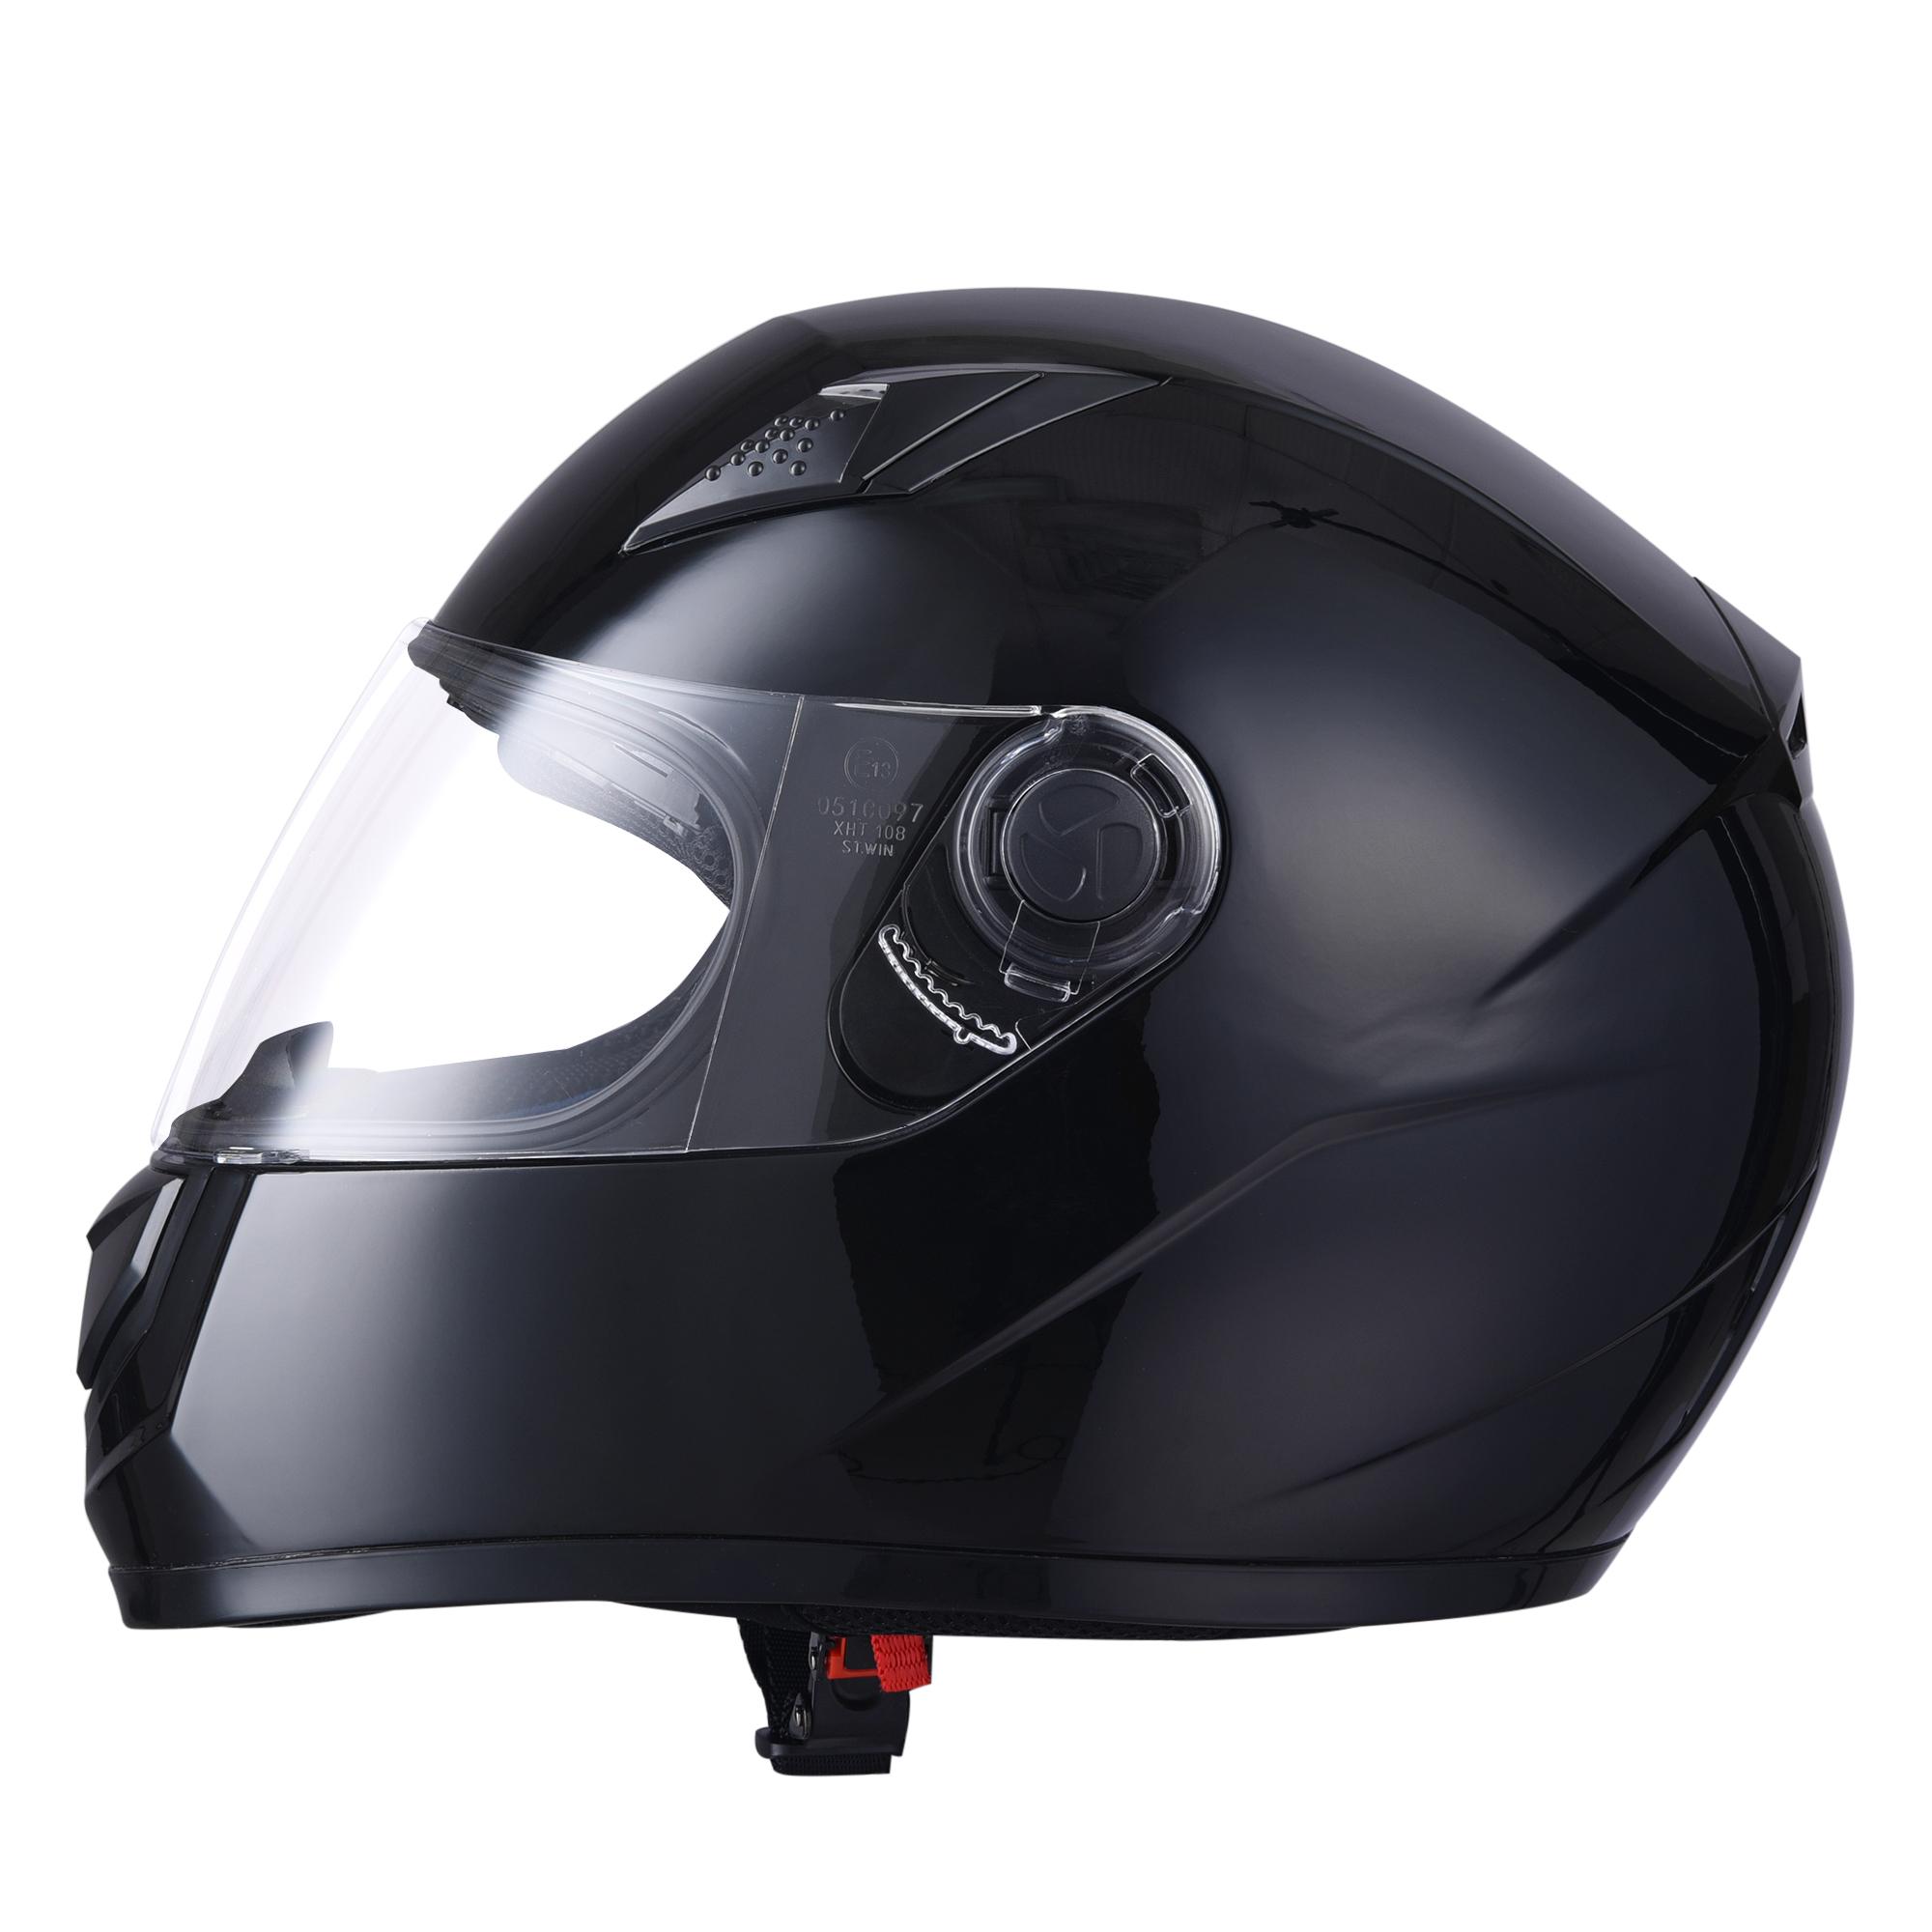 miniature 123 - AHR K12 Full Face Motorcycle Helmet DOT Air Vents Clear Visor Racing S M L XL